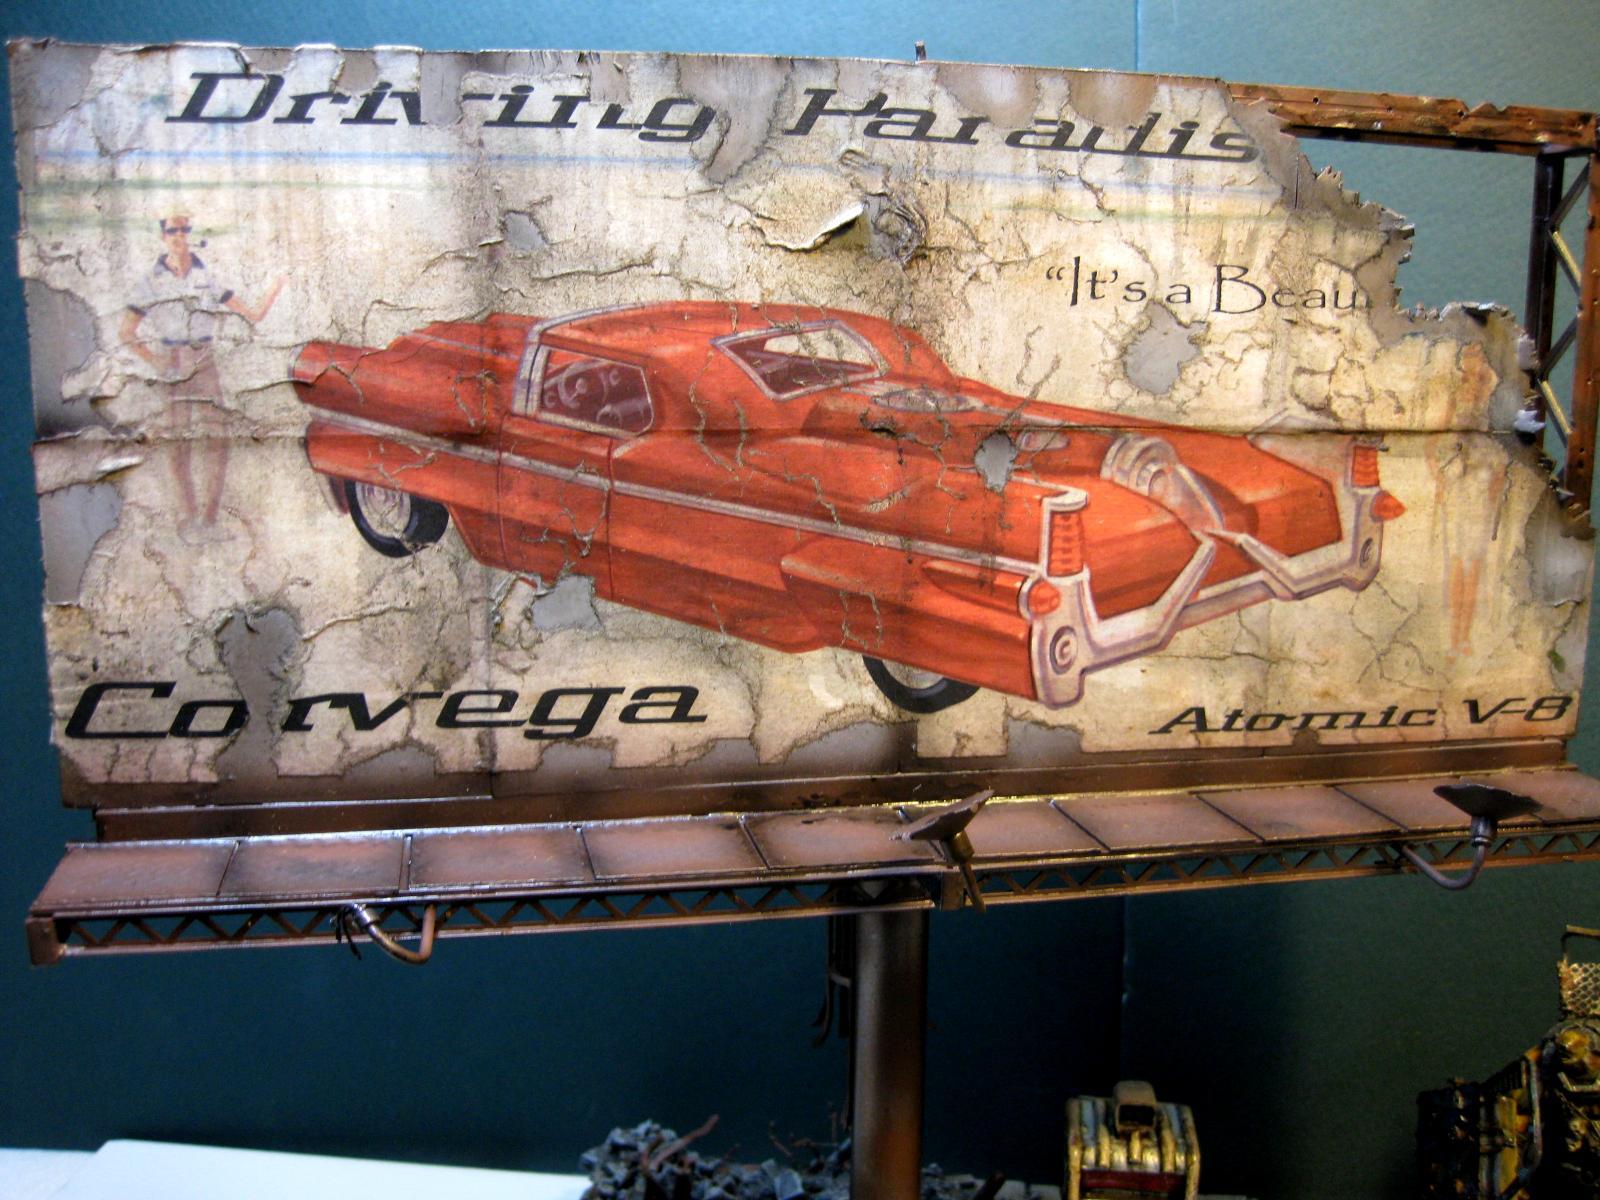 Billboard, Fallout, Terrain, Wallpaper